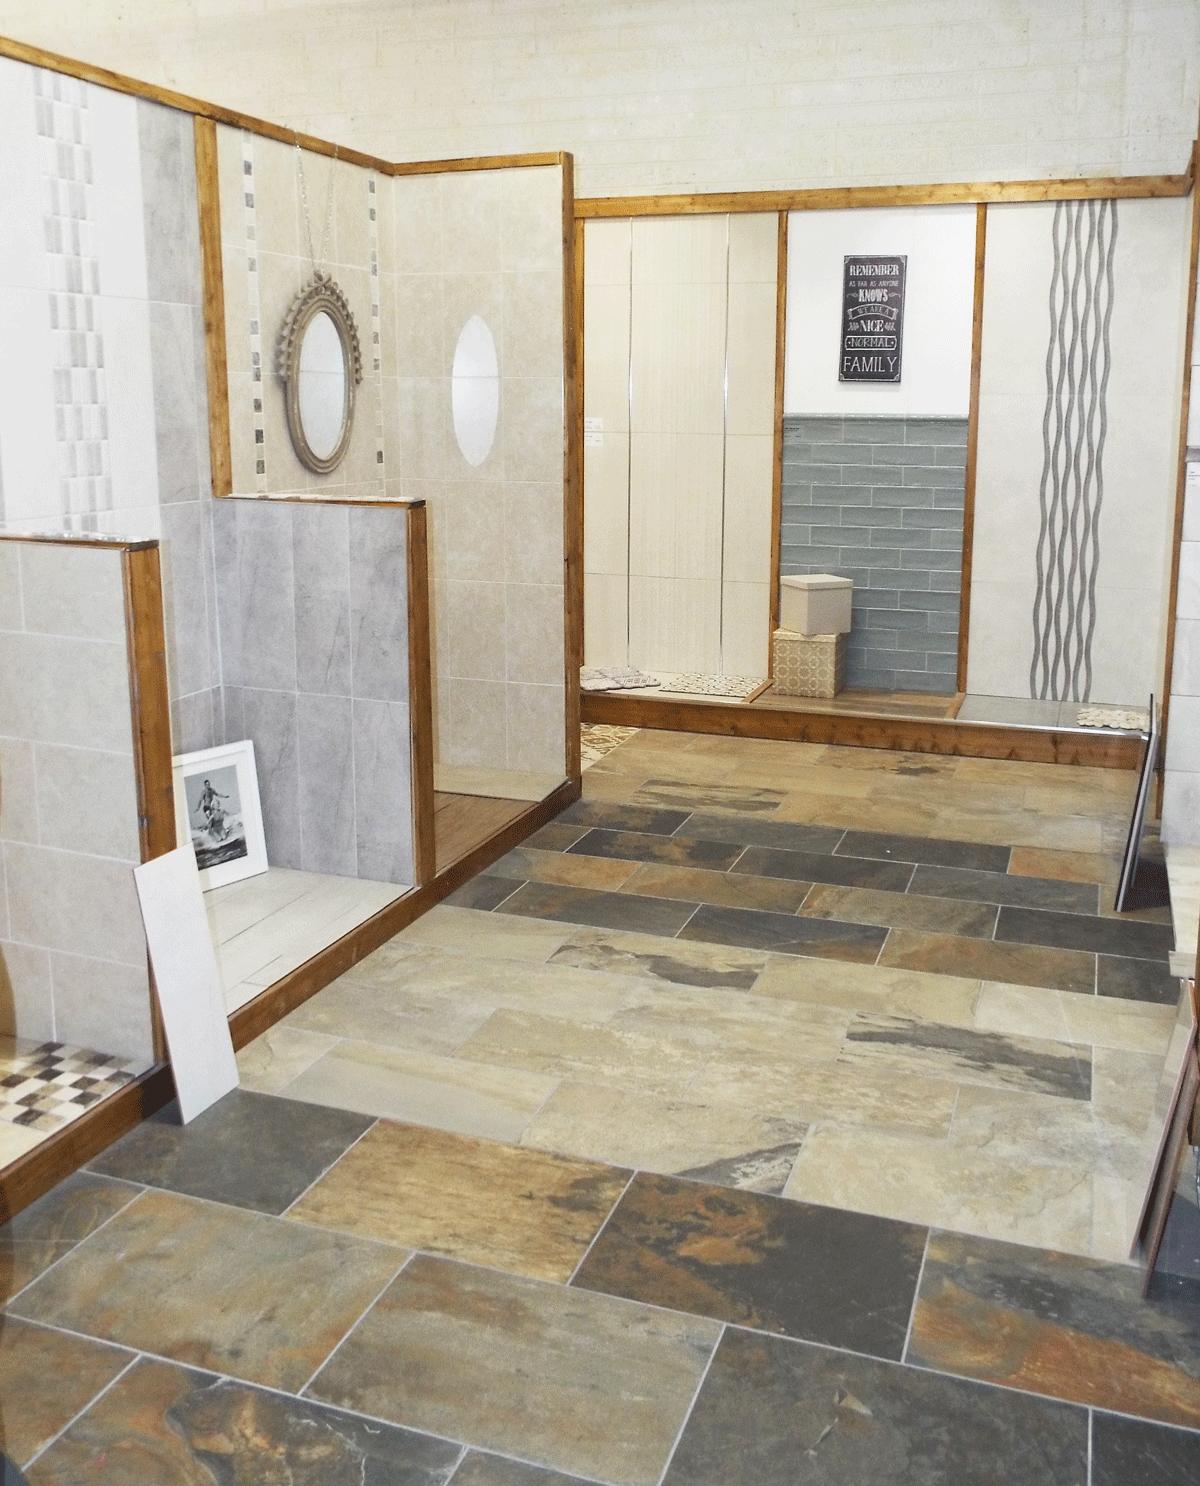 First Choice Tiles & Wooden Floors – Dungarvan Shop Window